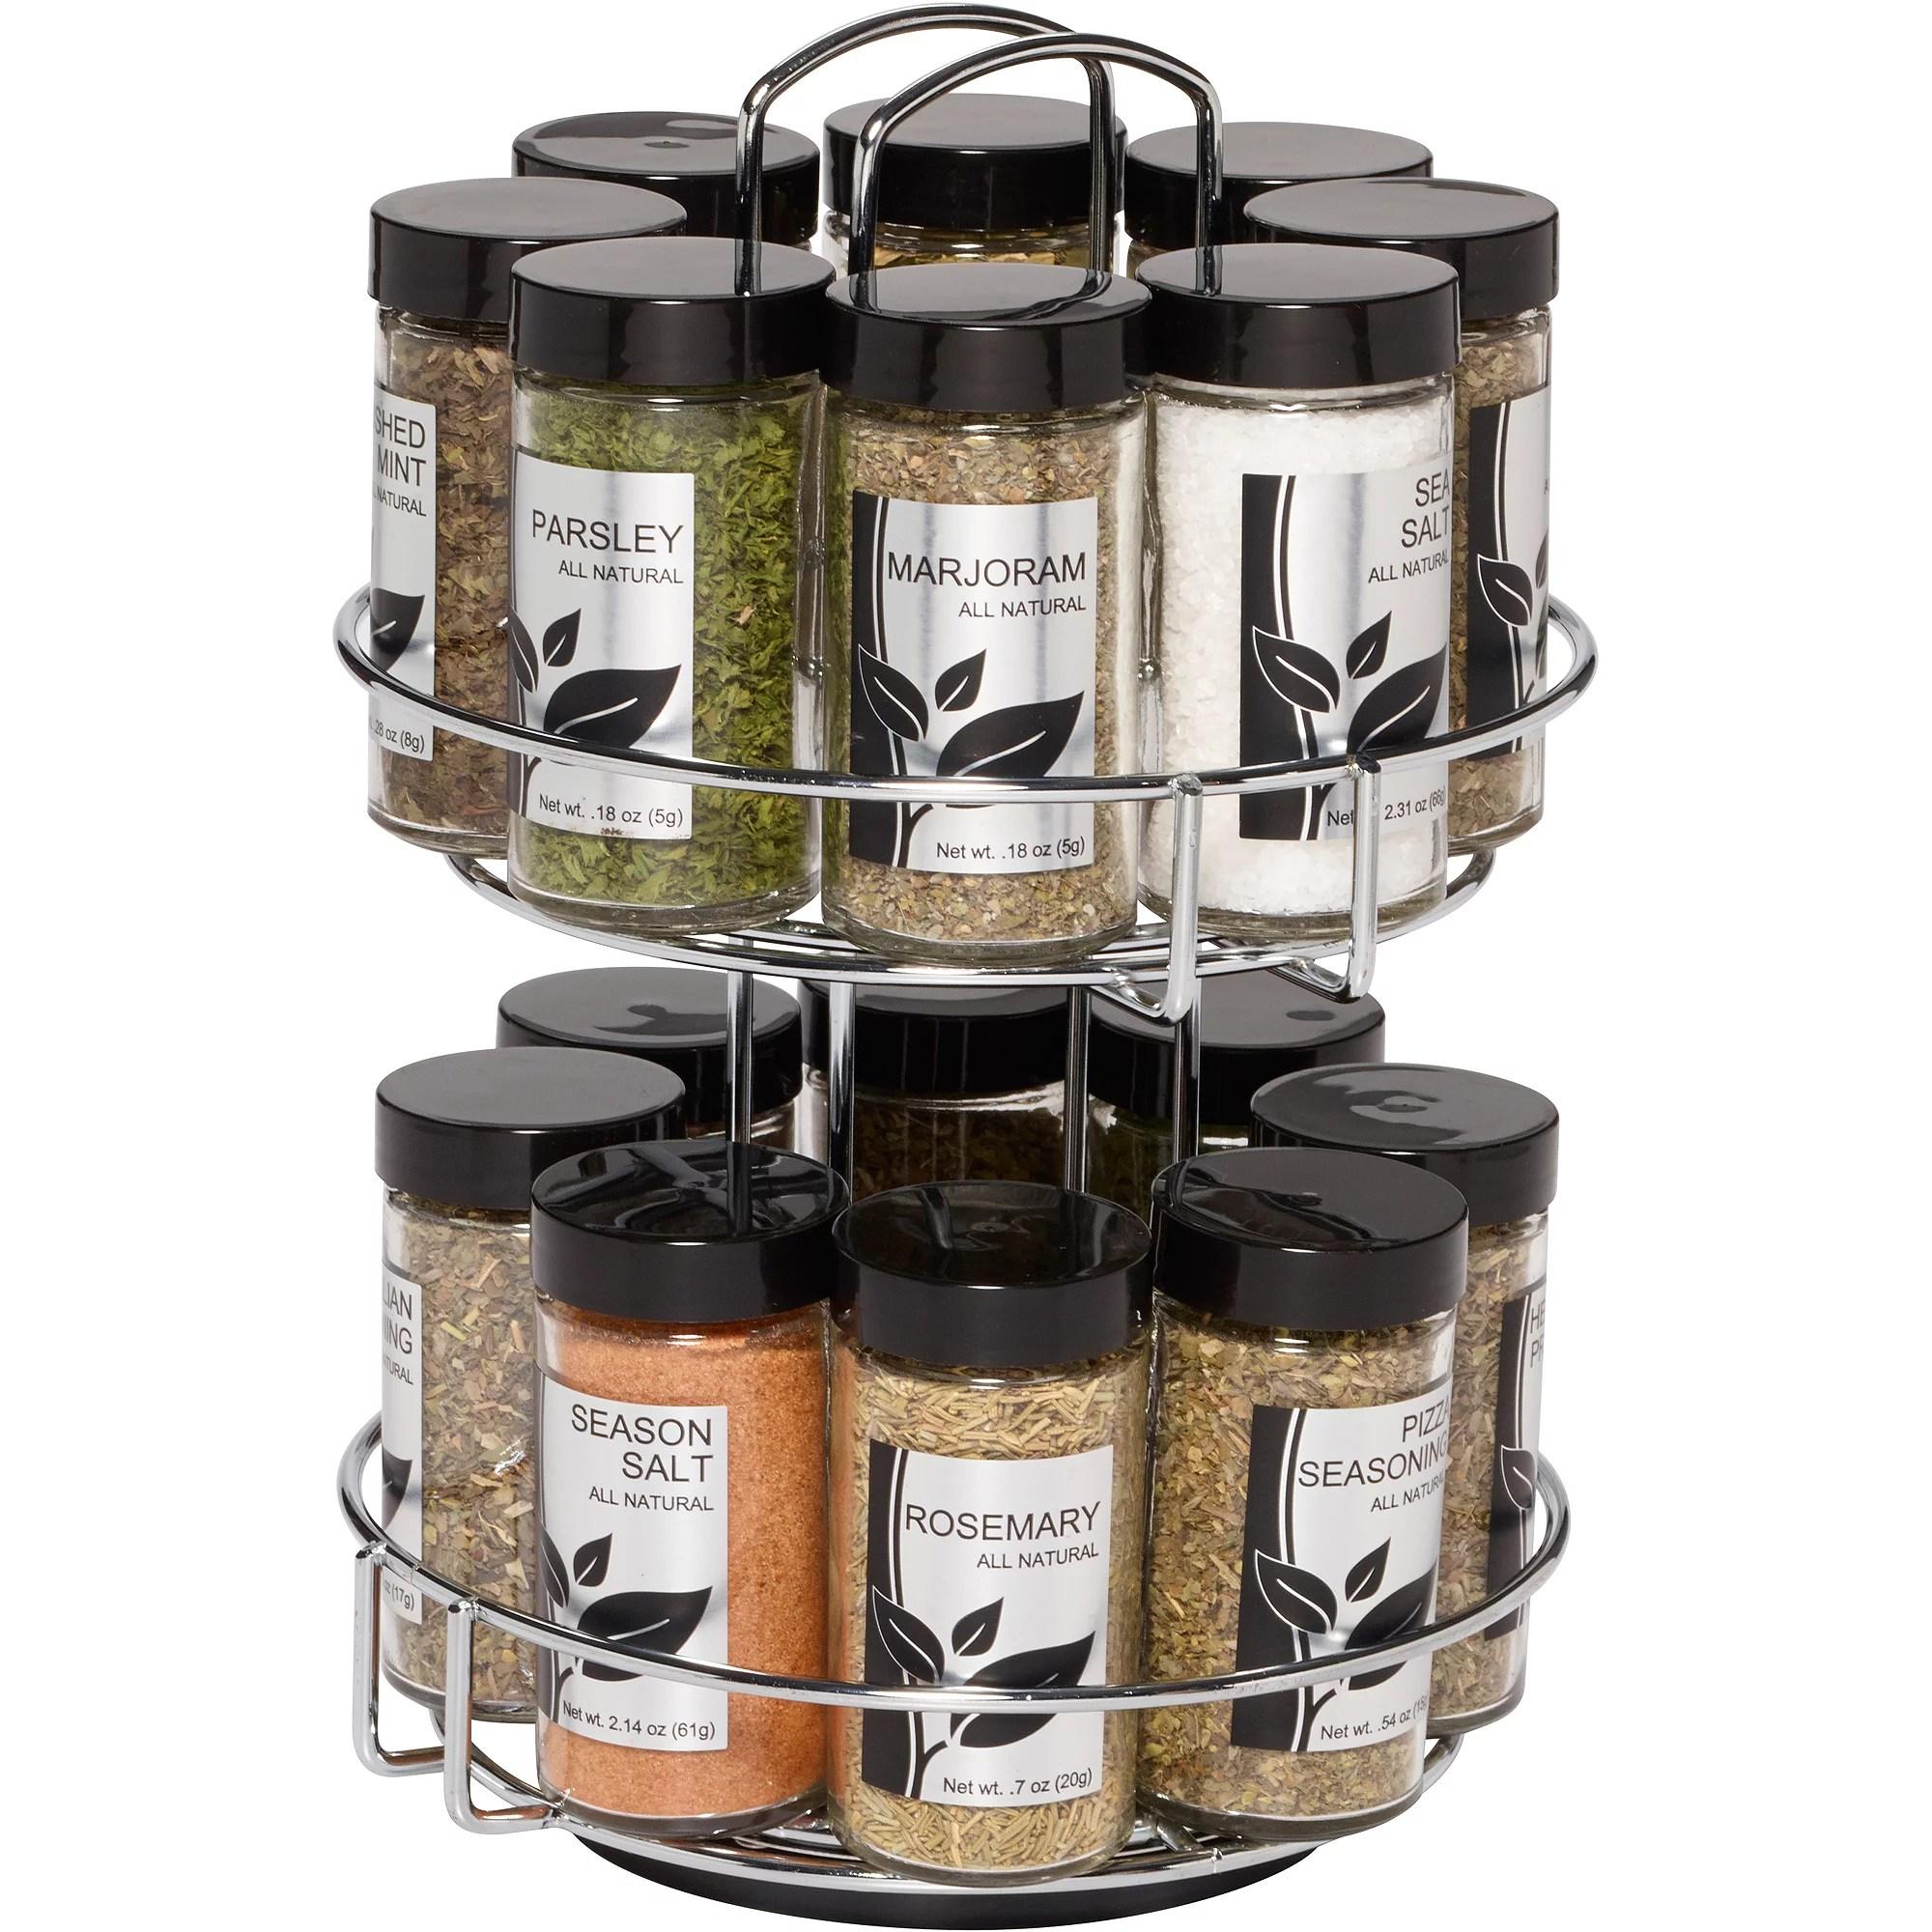 revolving spice racks for kitchen cupboards sale rack jar 16 metal storage with